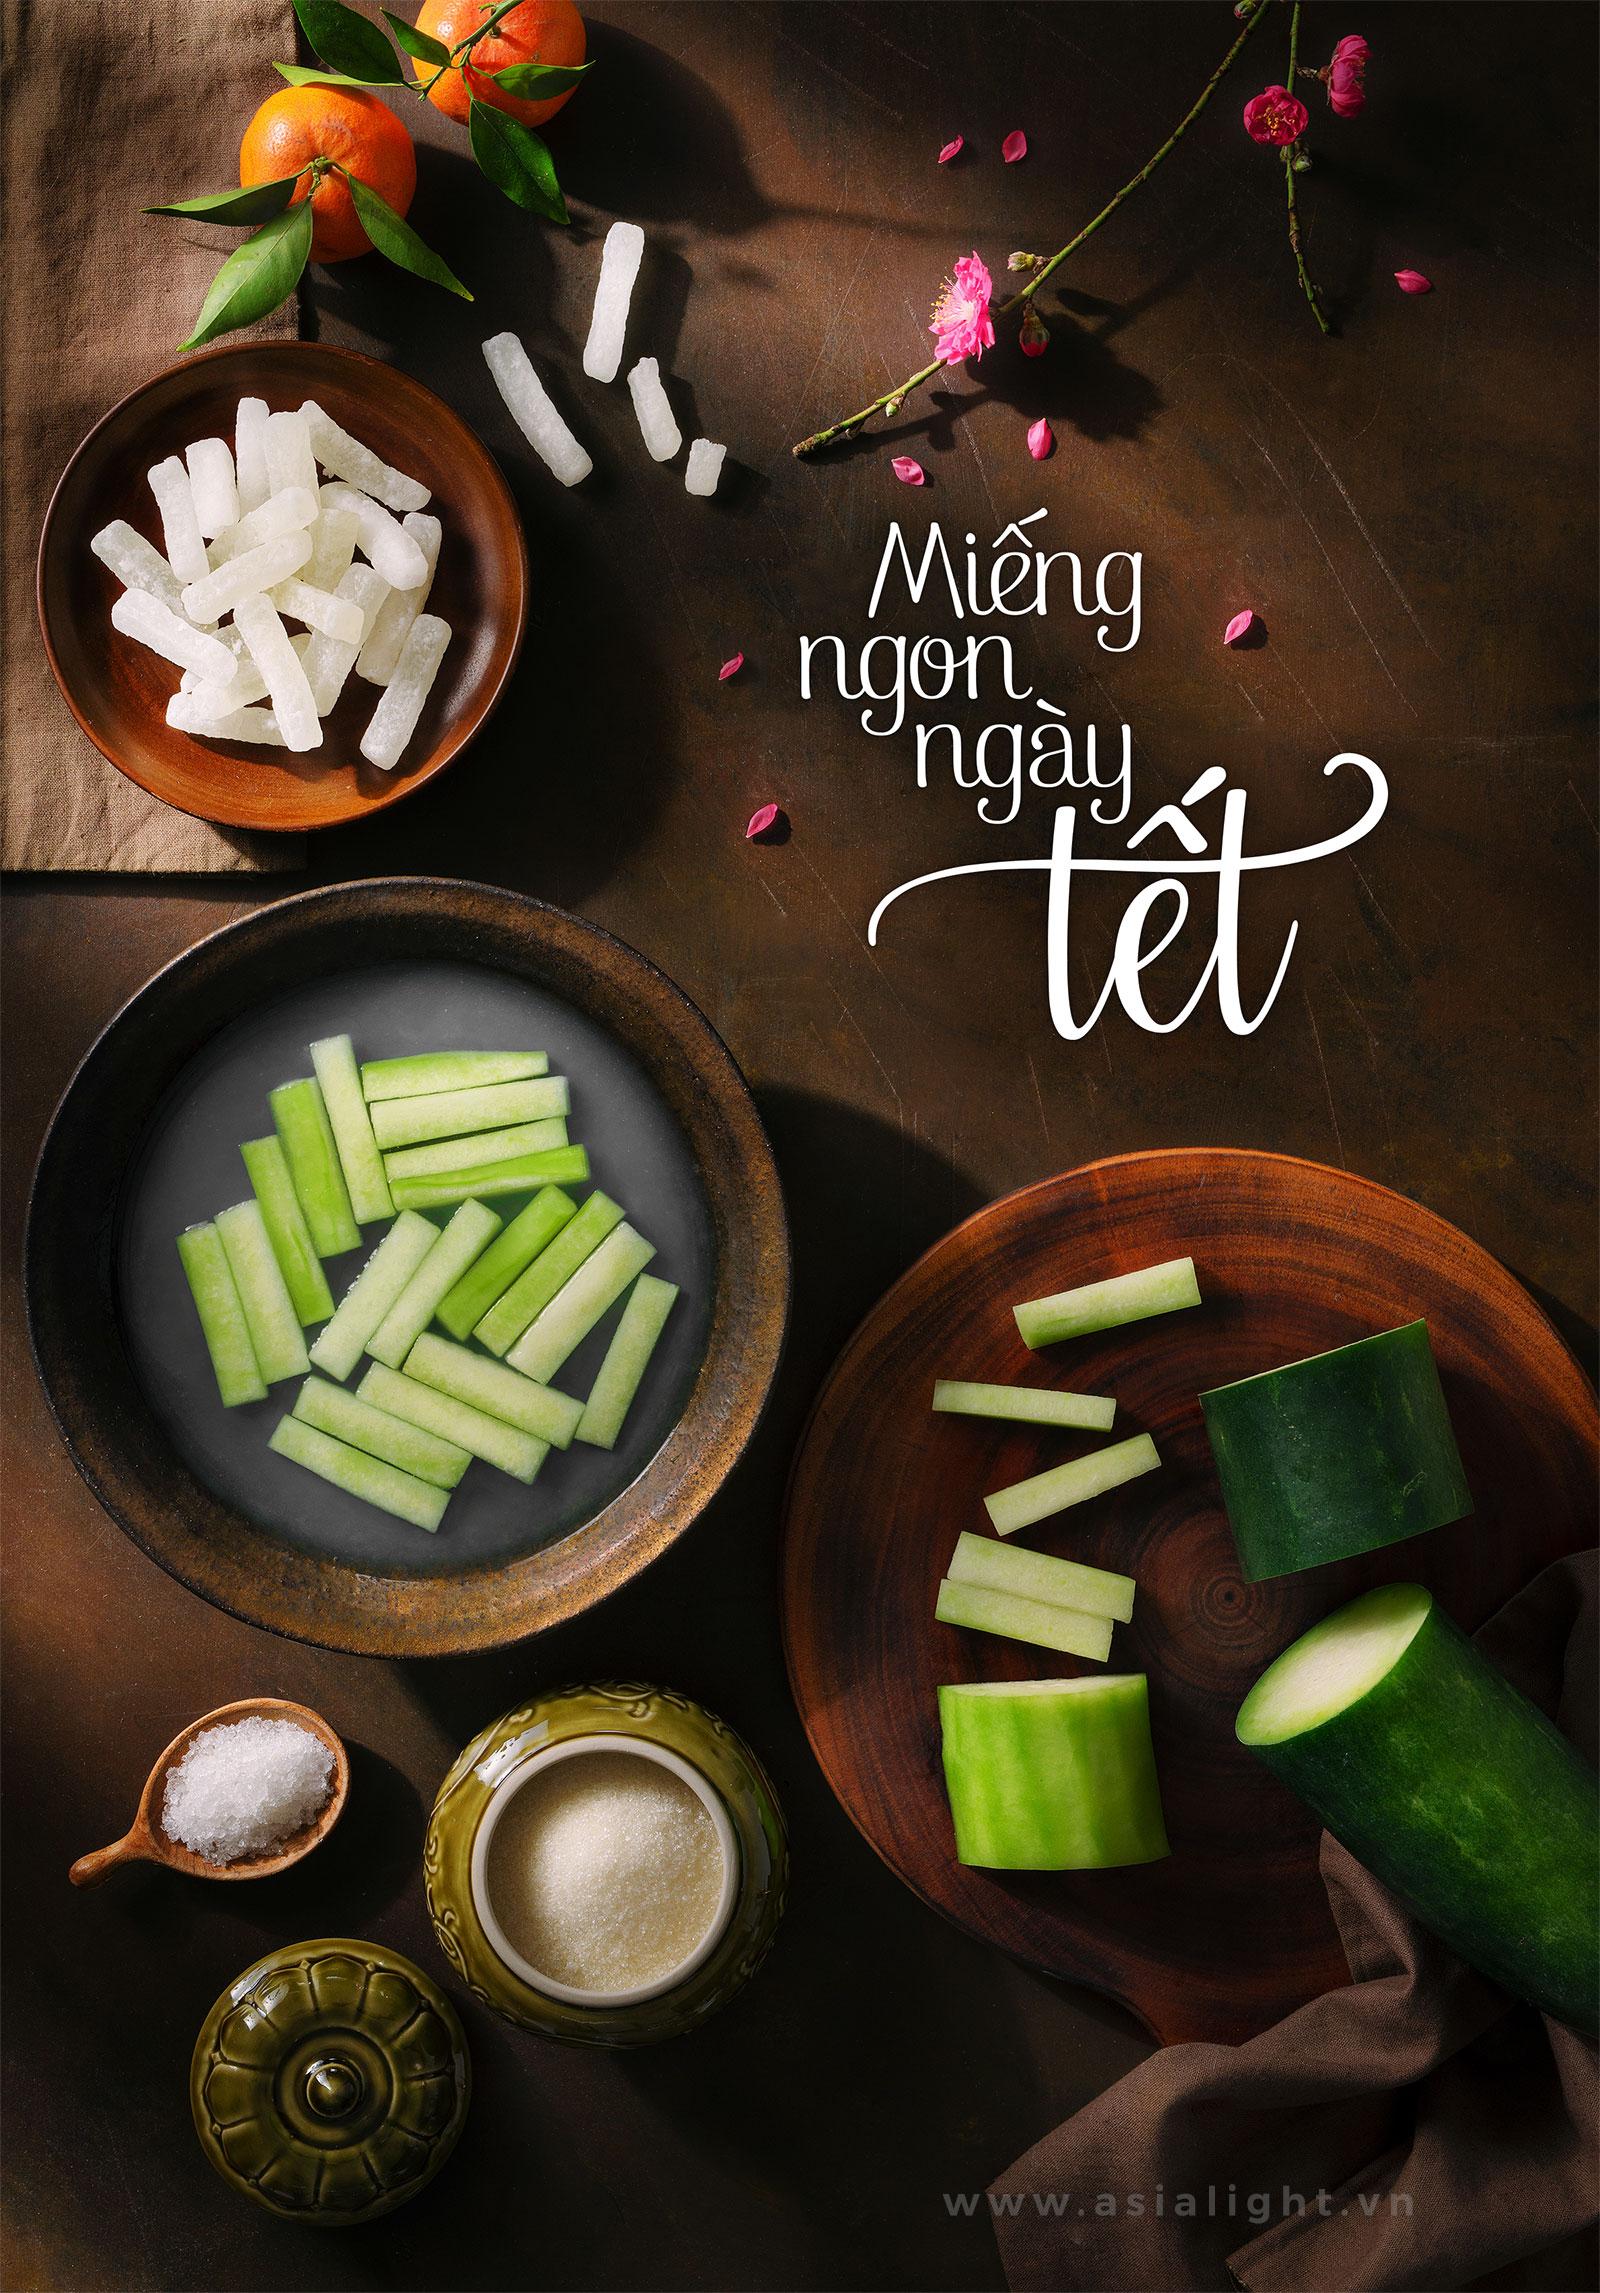 Lunar-New-Year-Vietnam-sweet